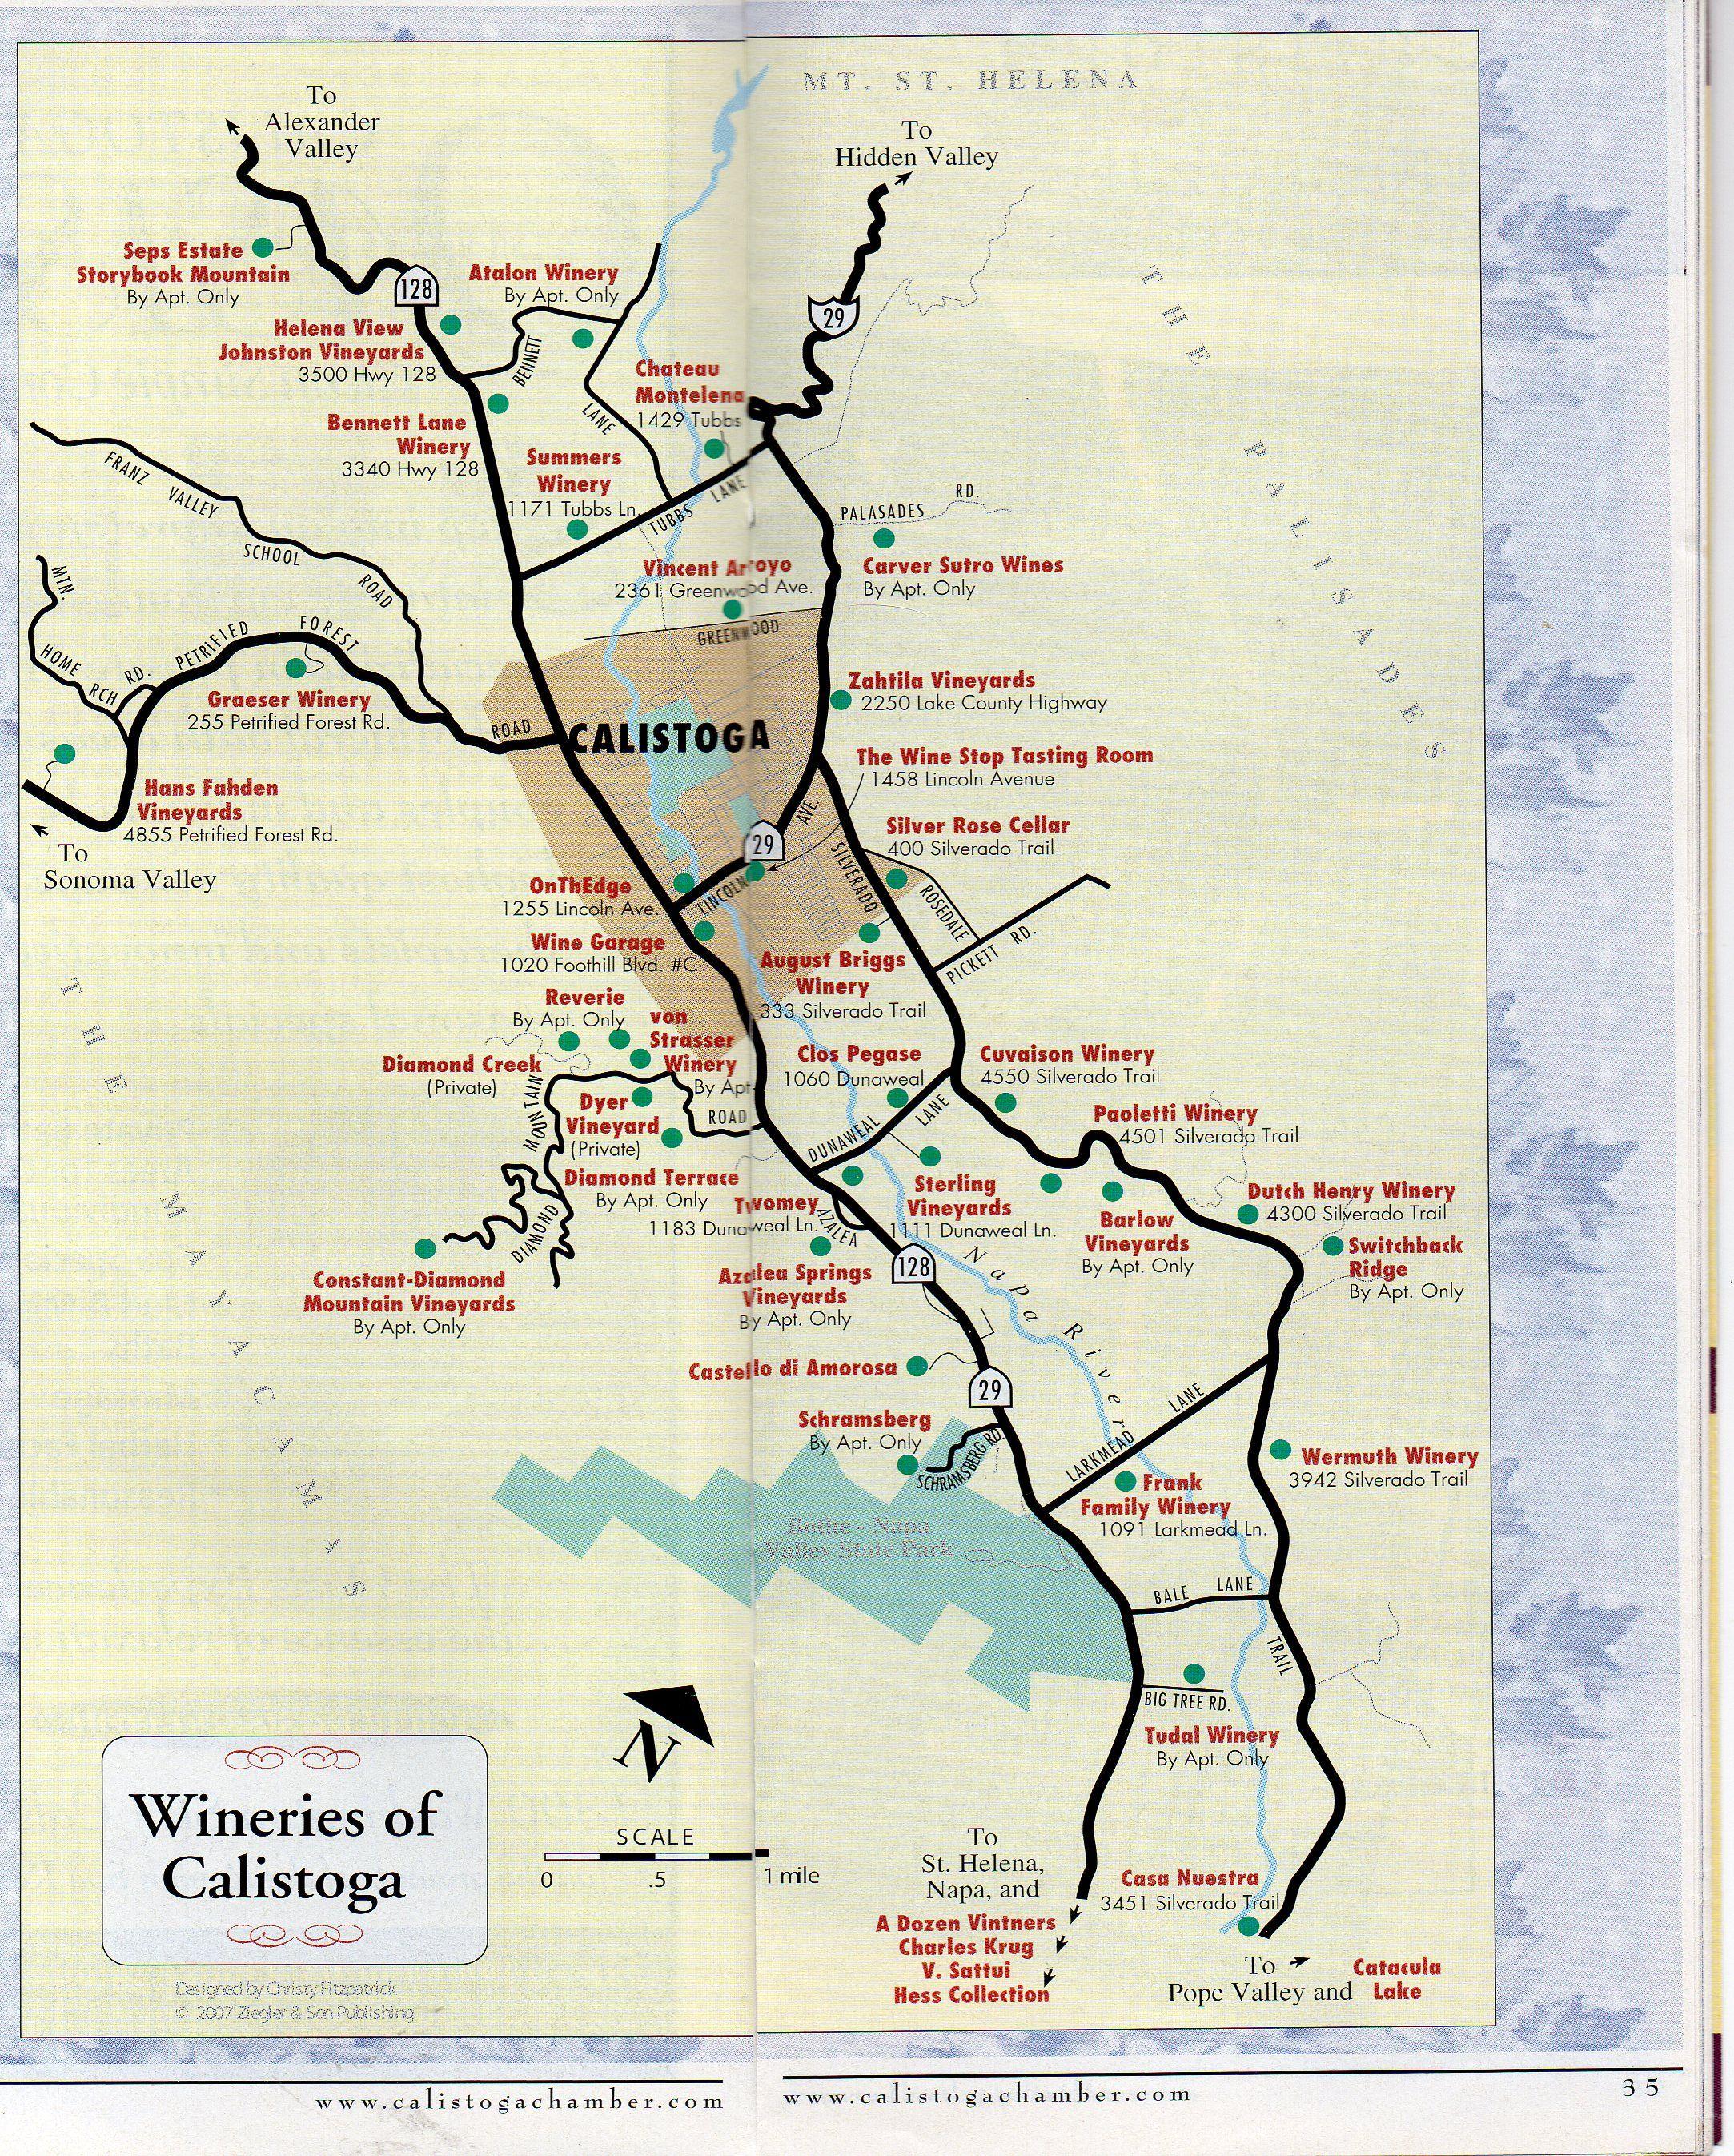 Calistoga Wineries Map   Napa and Lake Counties Wine ...